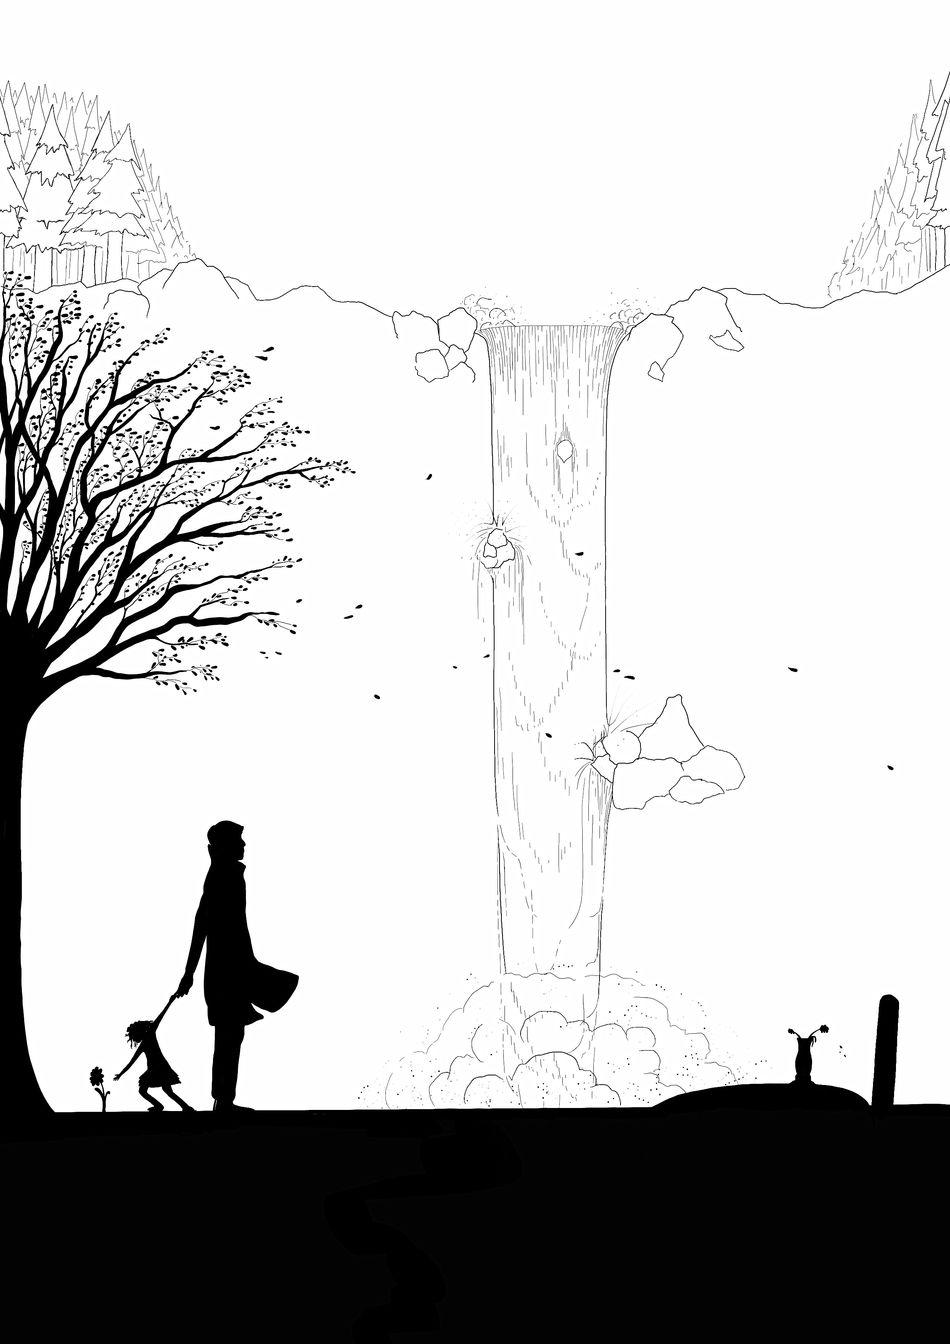 Drawing Draw Drawings Drawing ✏ Drawingtime Draw By Me My Draw My Drawing My Drawings My Draw ♥ Ipad Ipad Pro Silhouette Sketch Tree People Outdoors Day Nature Digital Art Digital Blackandwhite Black And White Black & White Silhouette